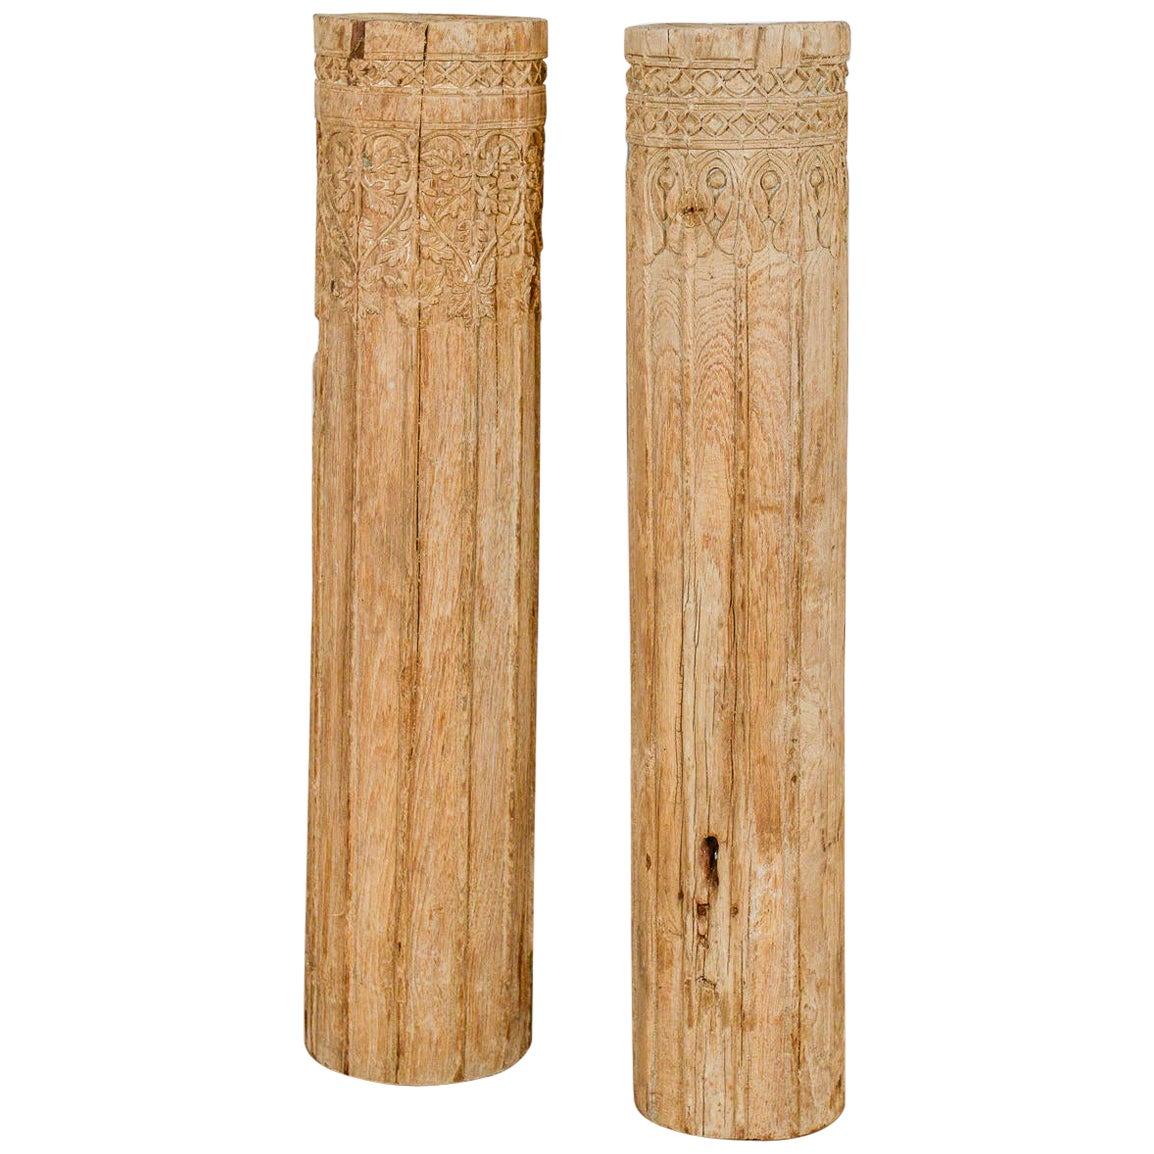 Decorative Short Hardwood Pillars, 20th Century